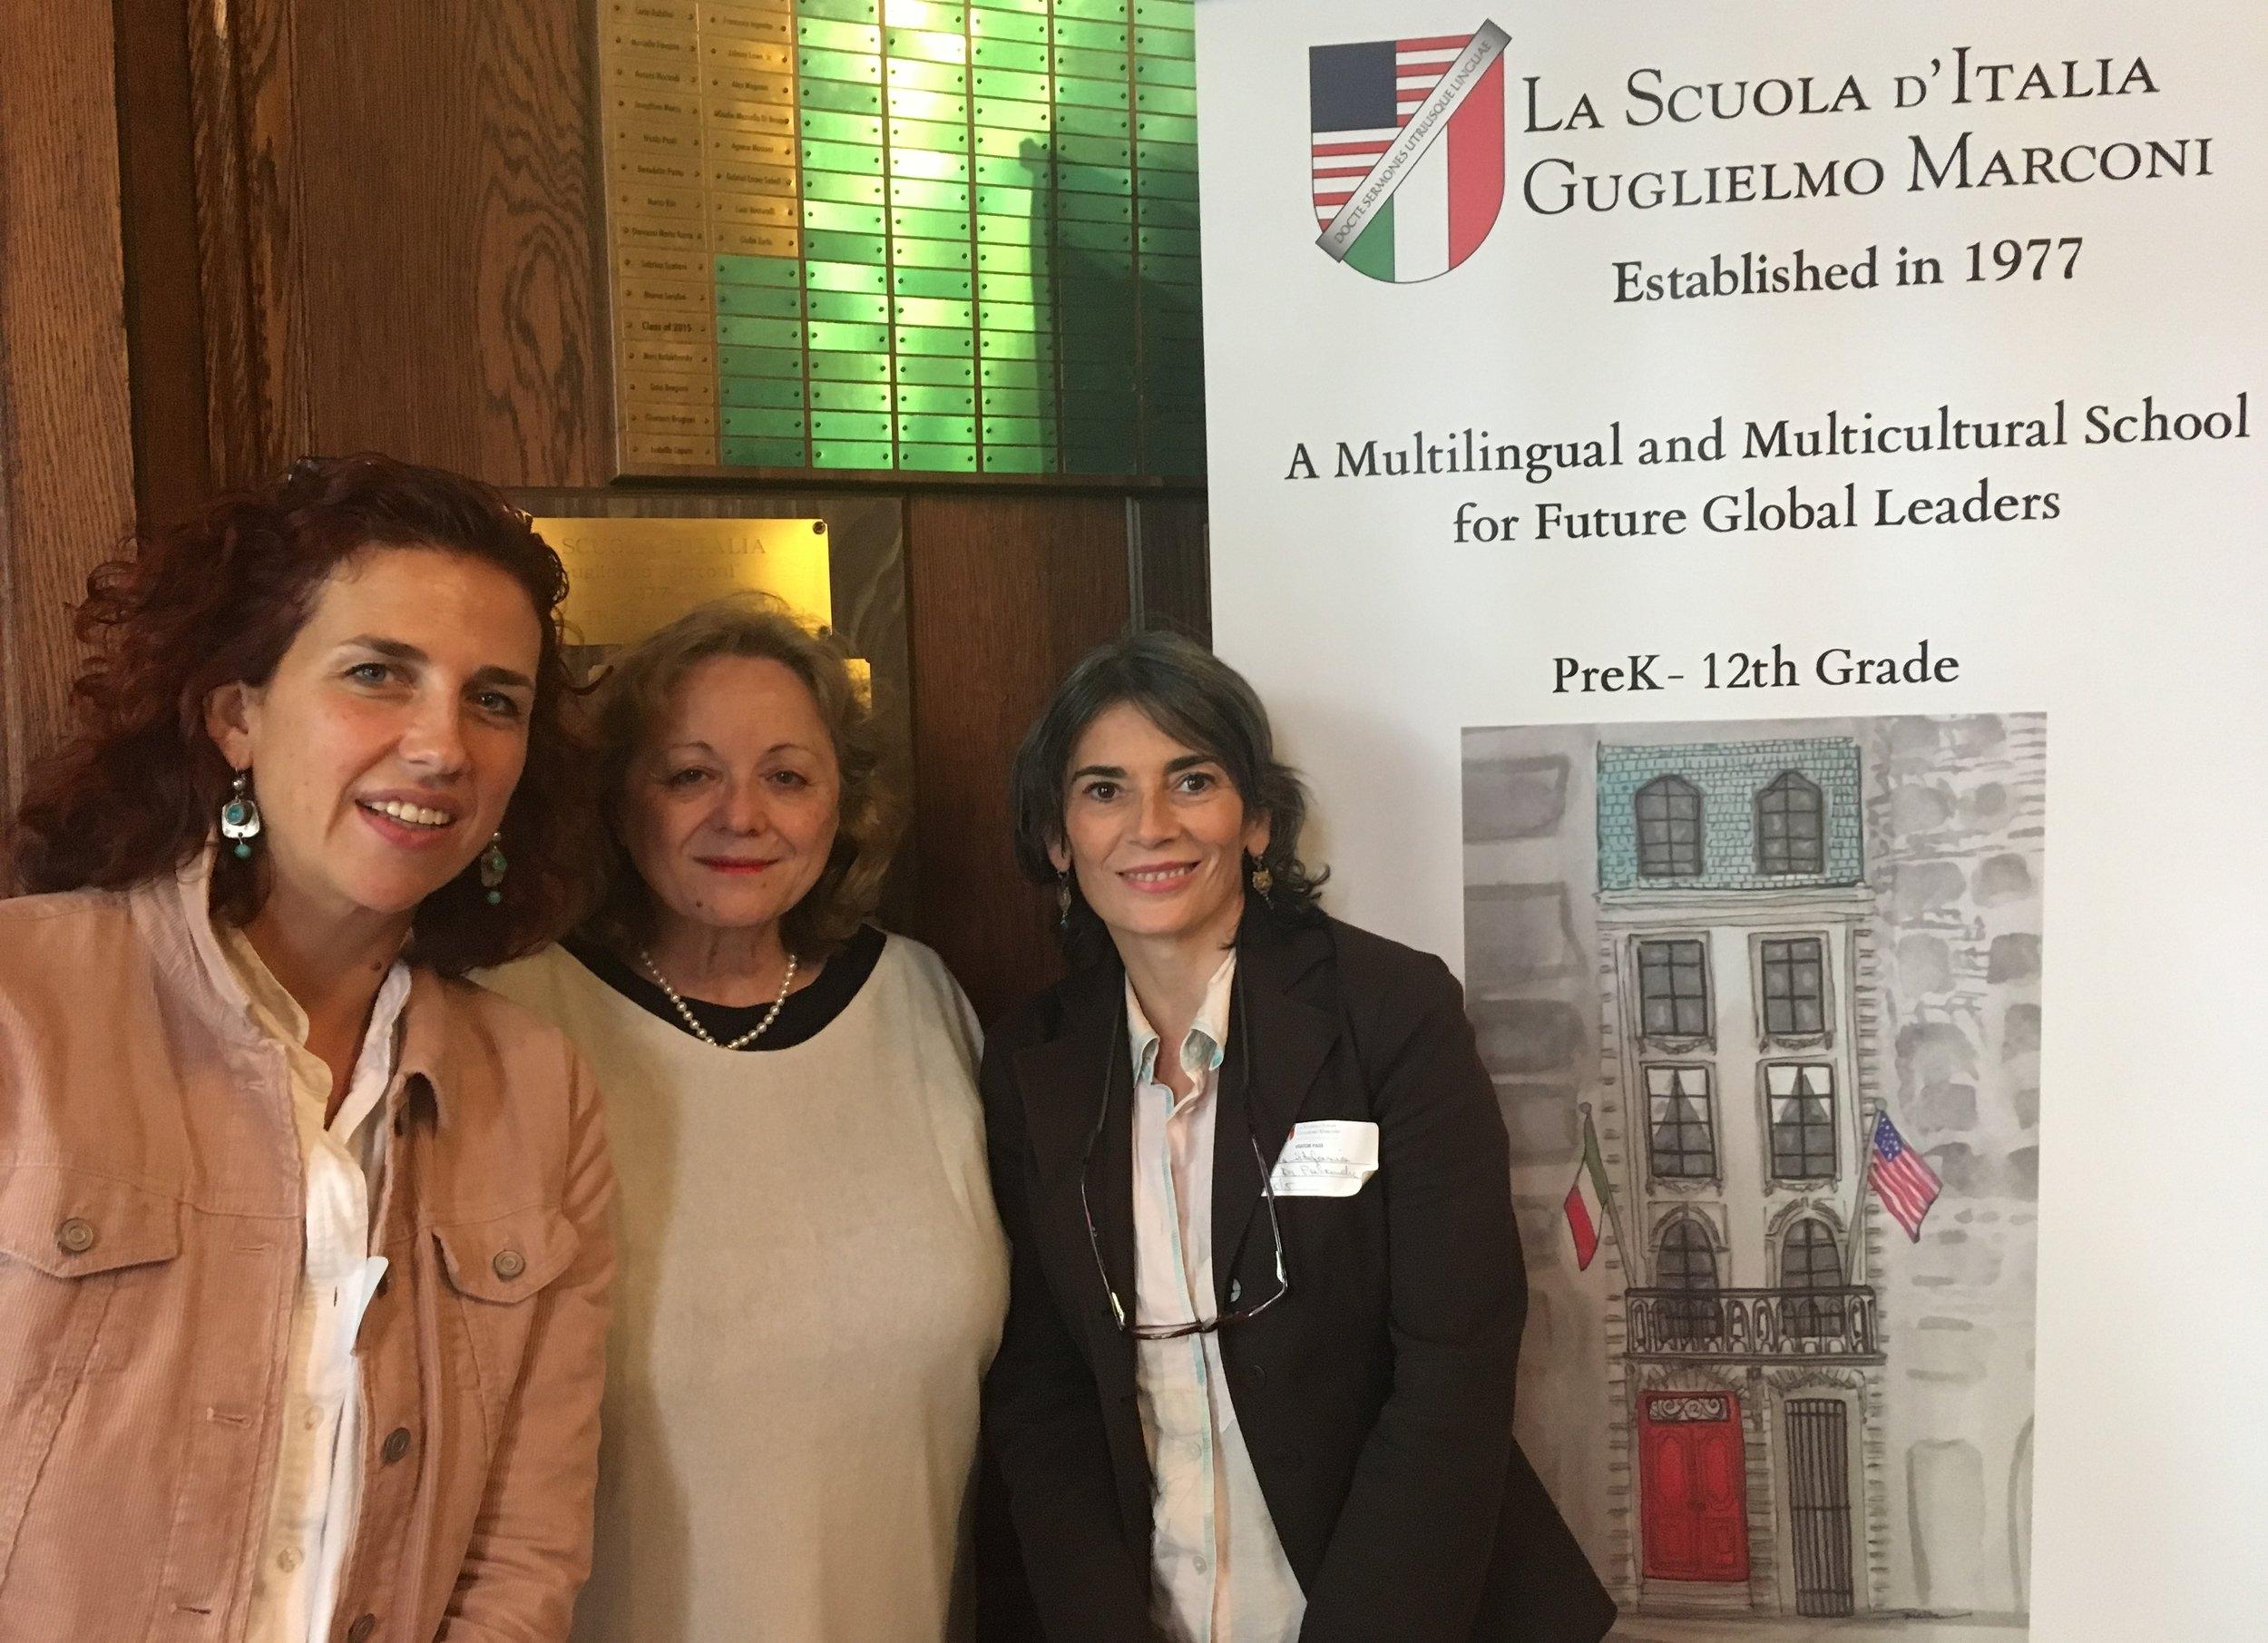 Stefania & Benedetta with Maria Palandra, the Principal of La Scuola d'Italia Marconi - October 2018